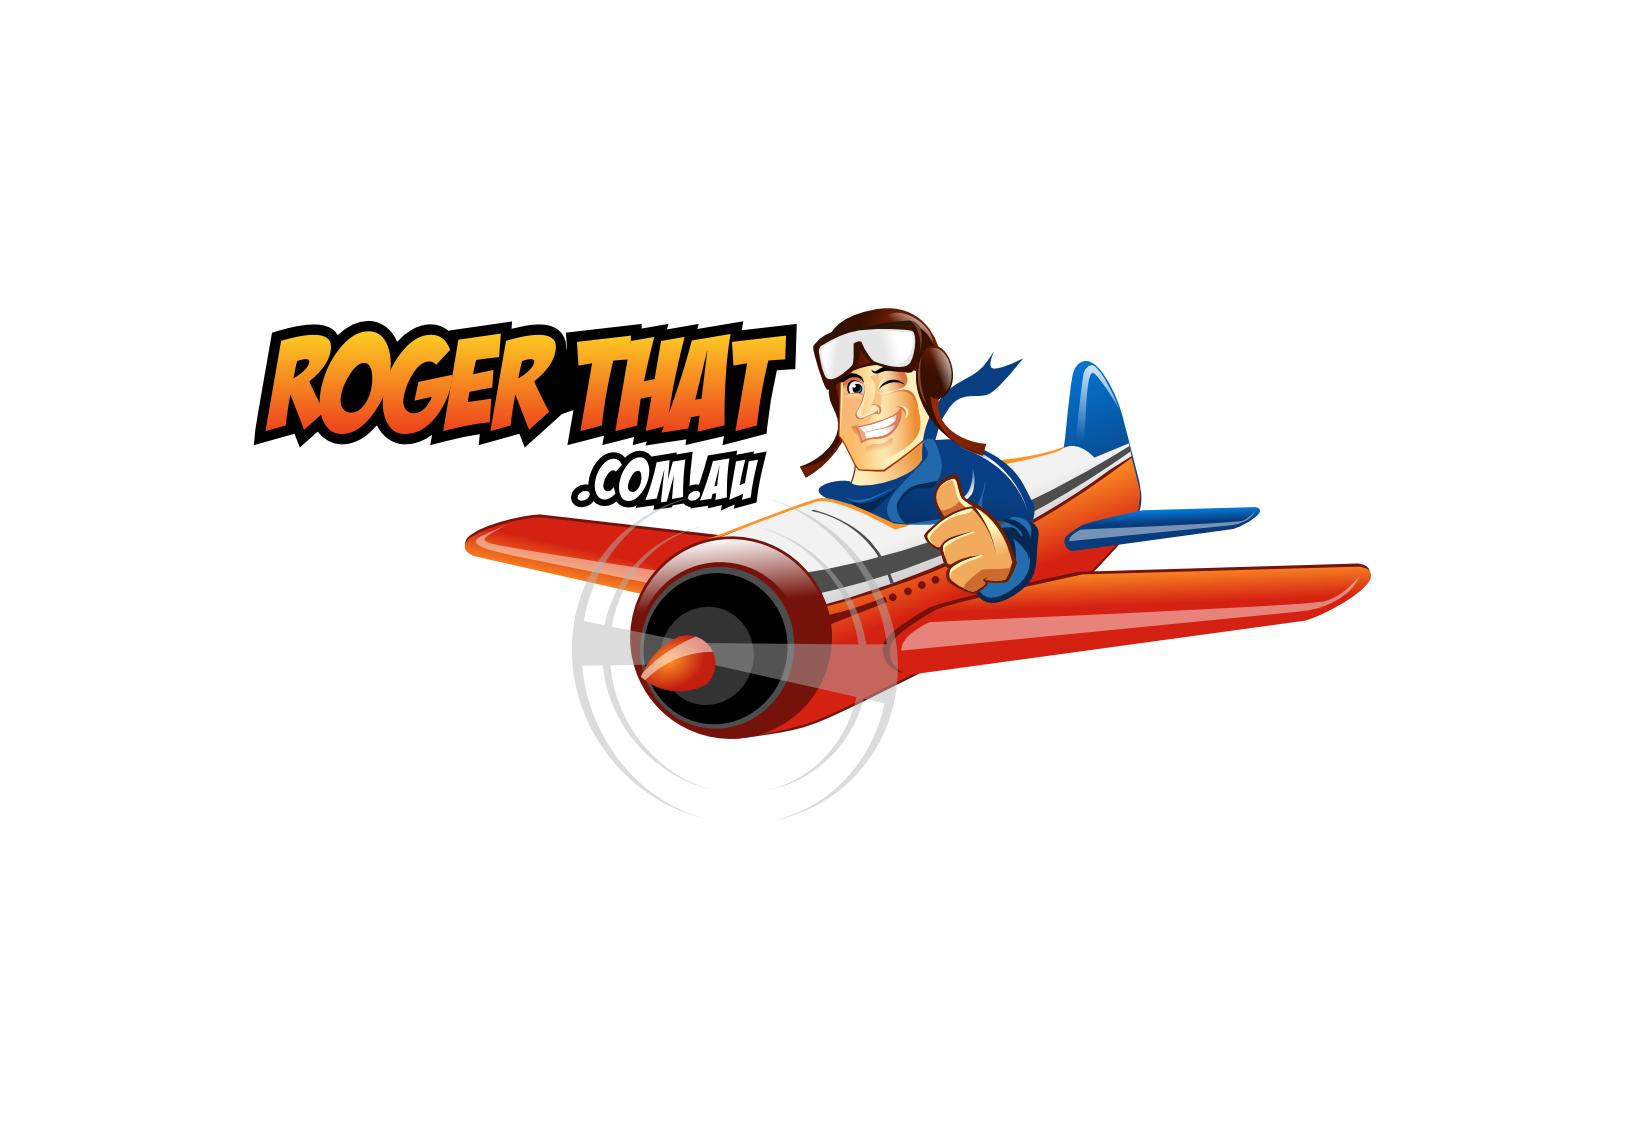 Help RogerThat.com.au with a new logo